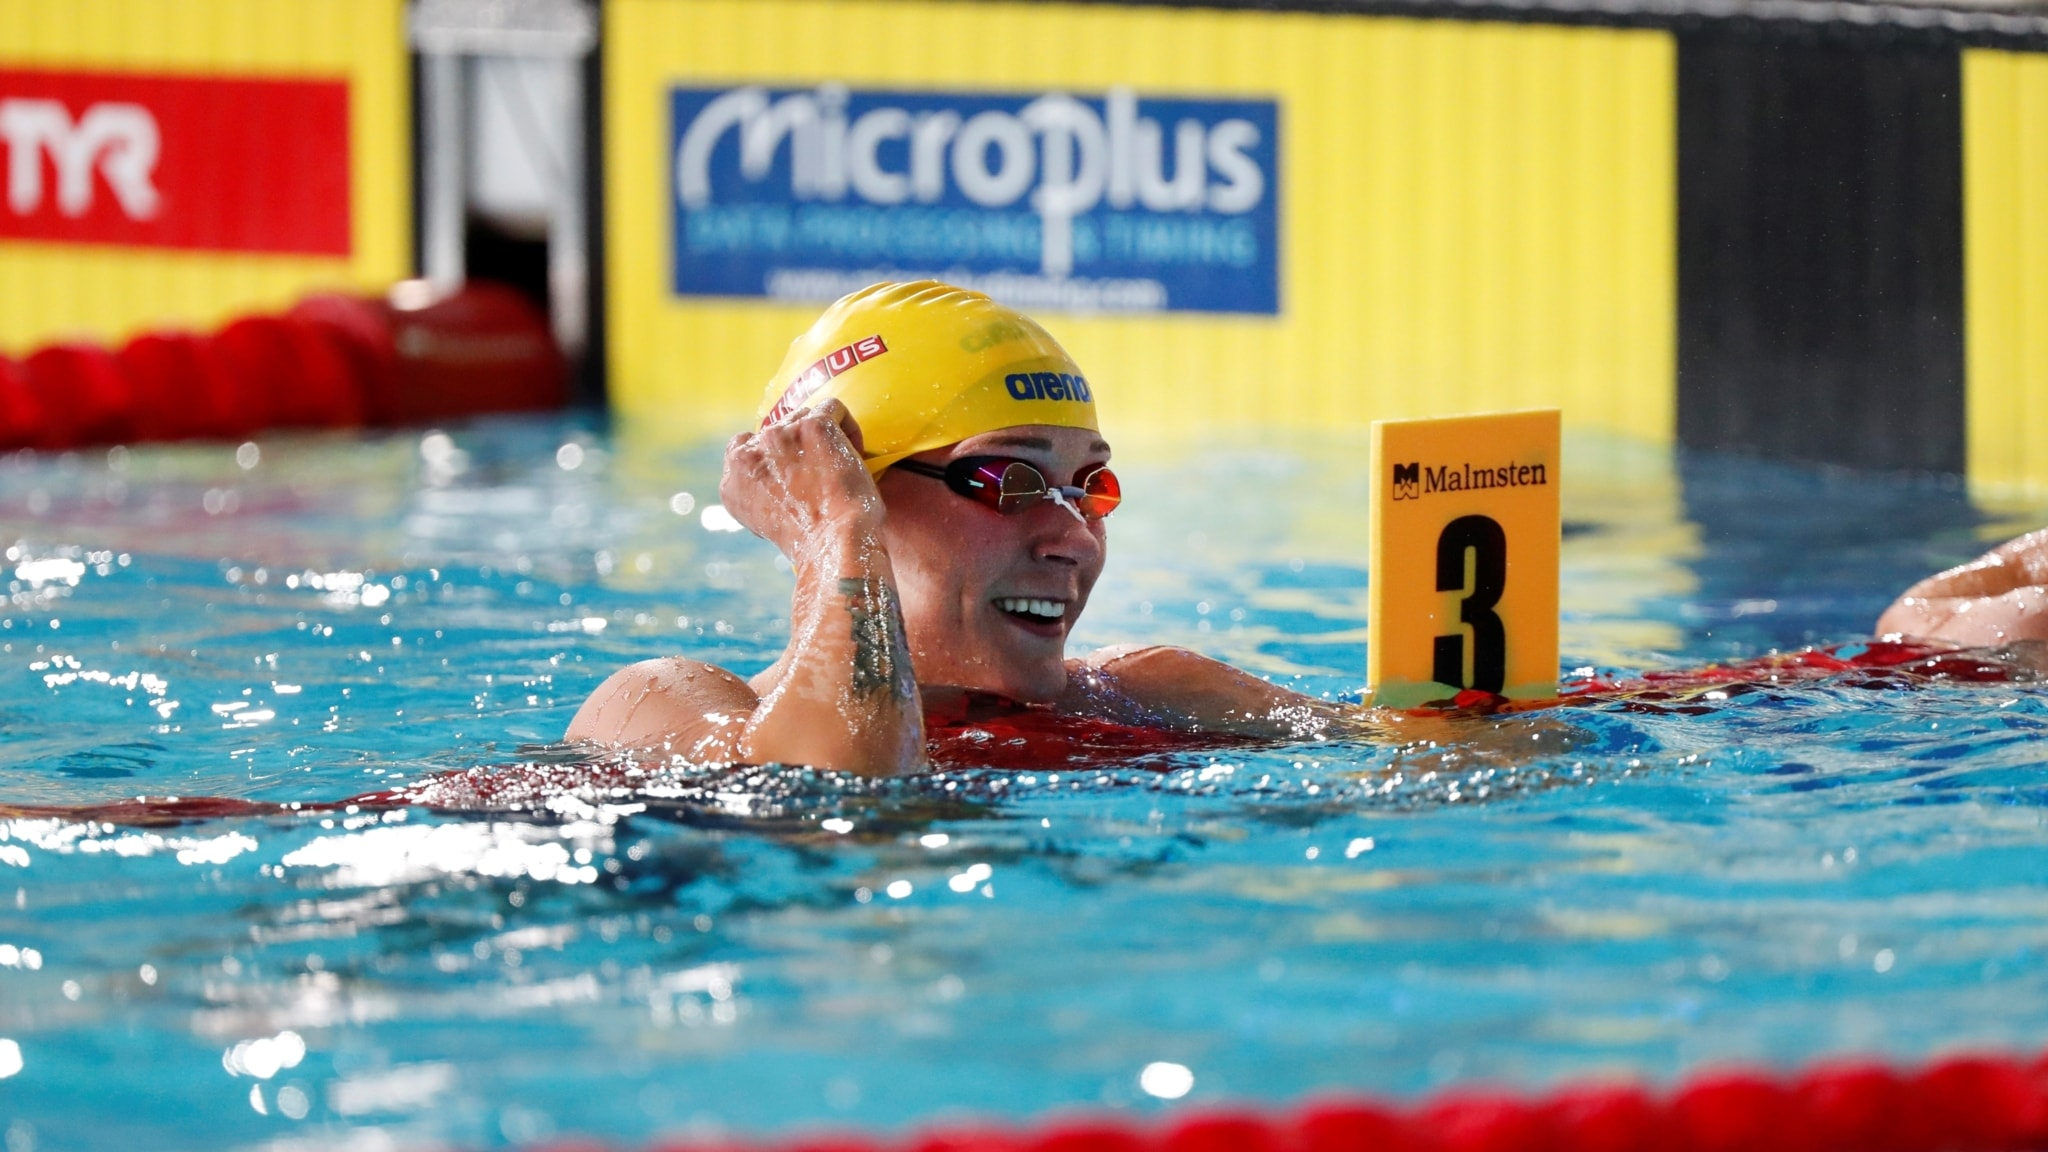 Sjostrom simmar for nytt guld